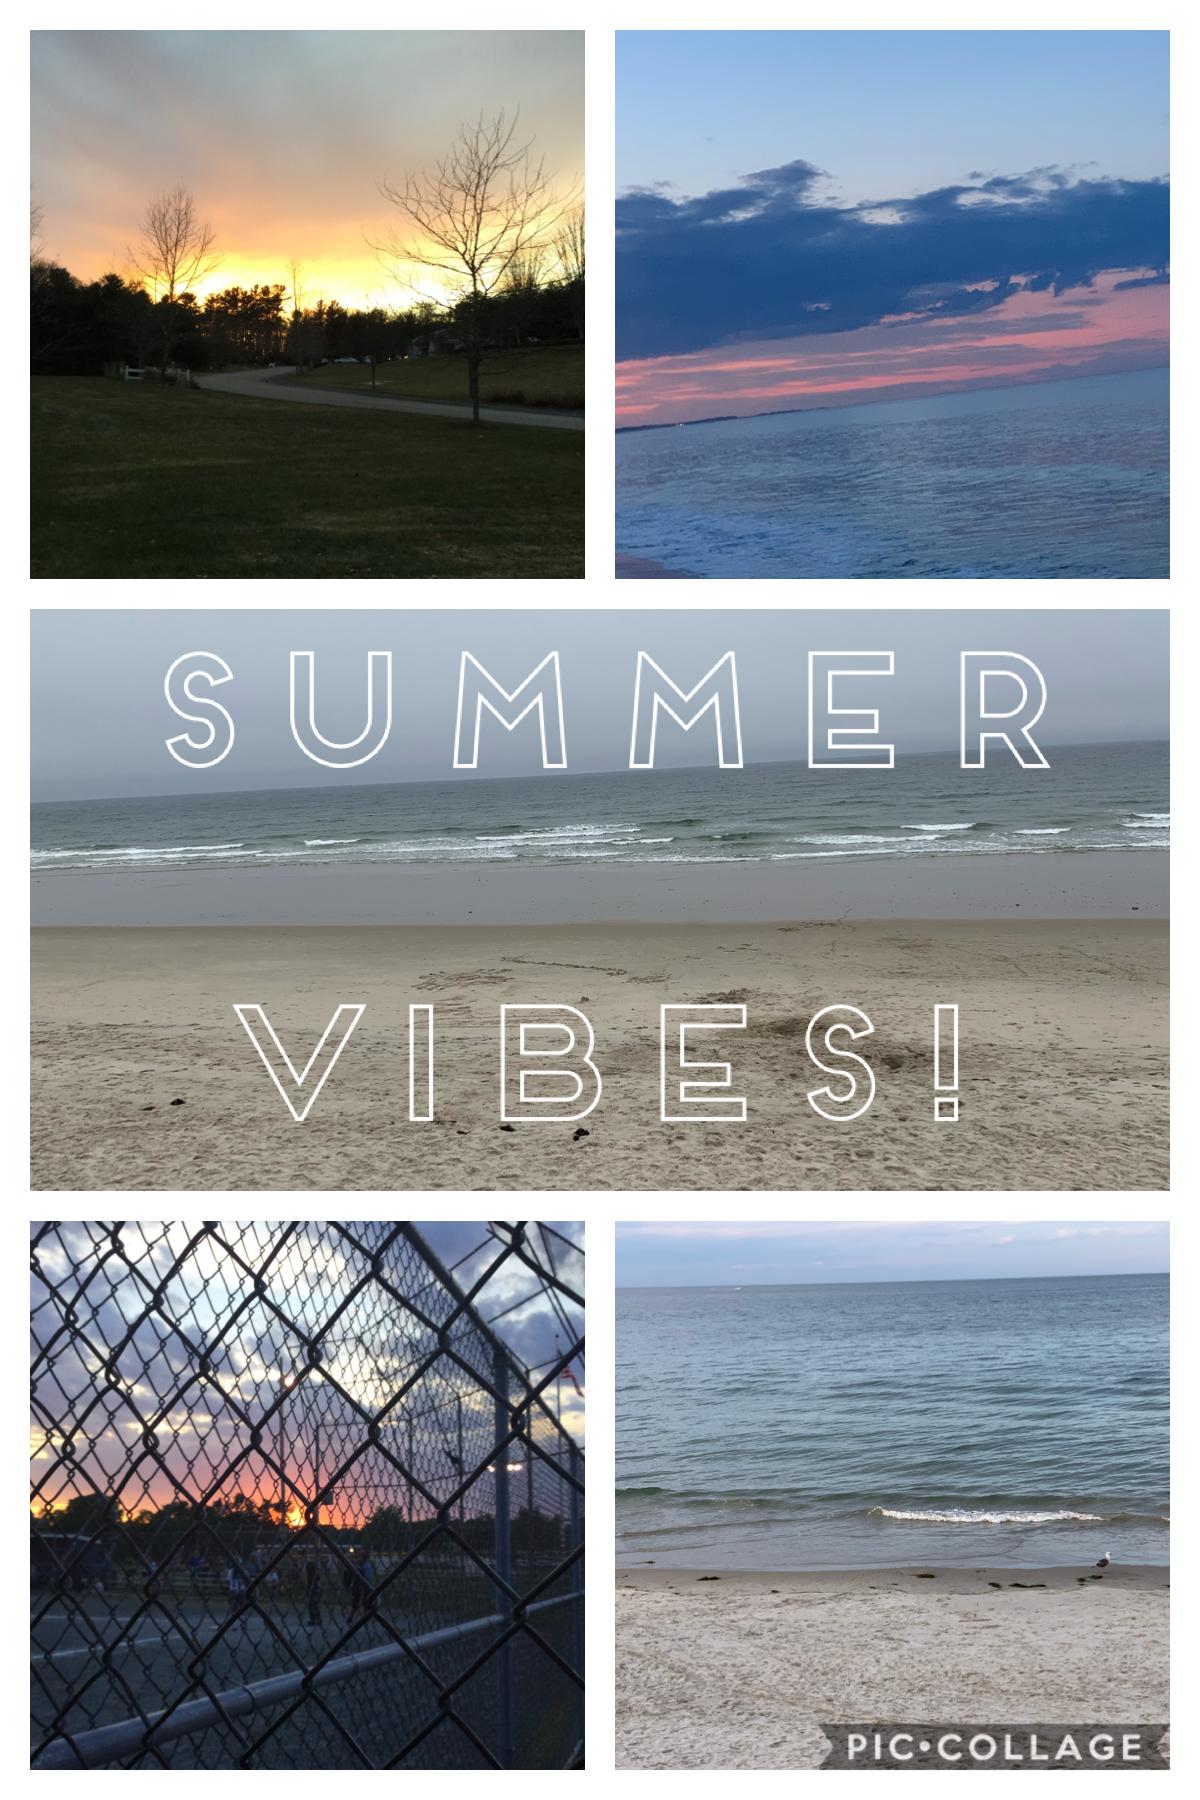 Summer vibes!